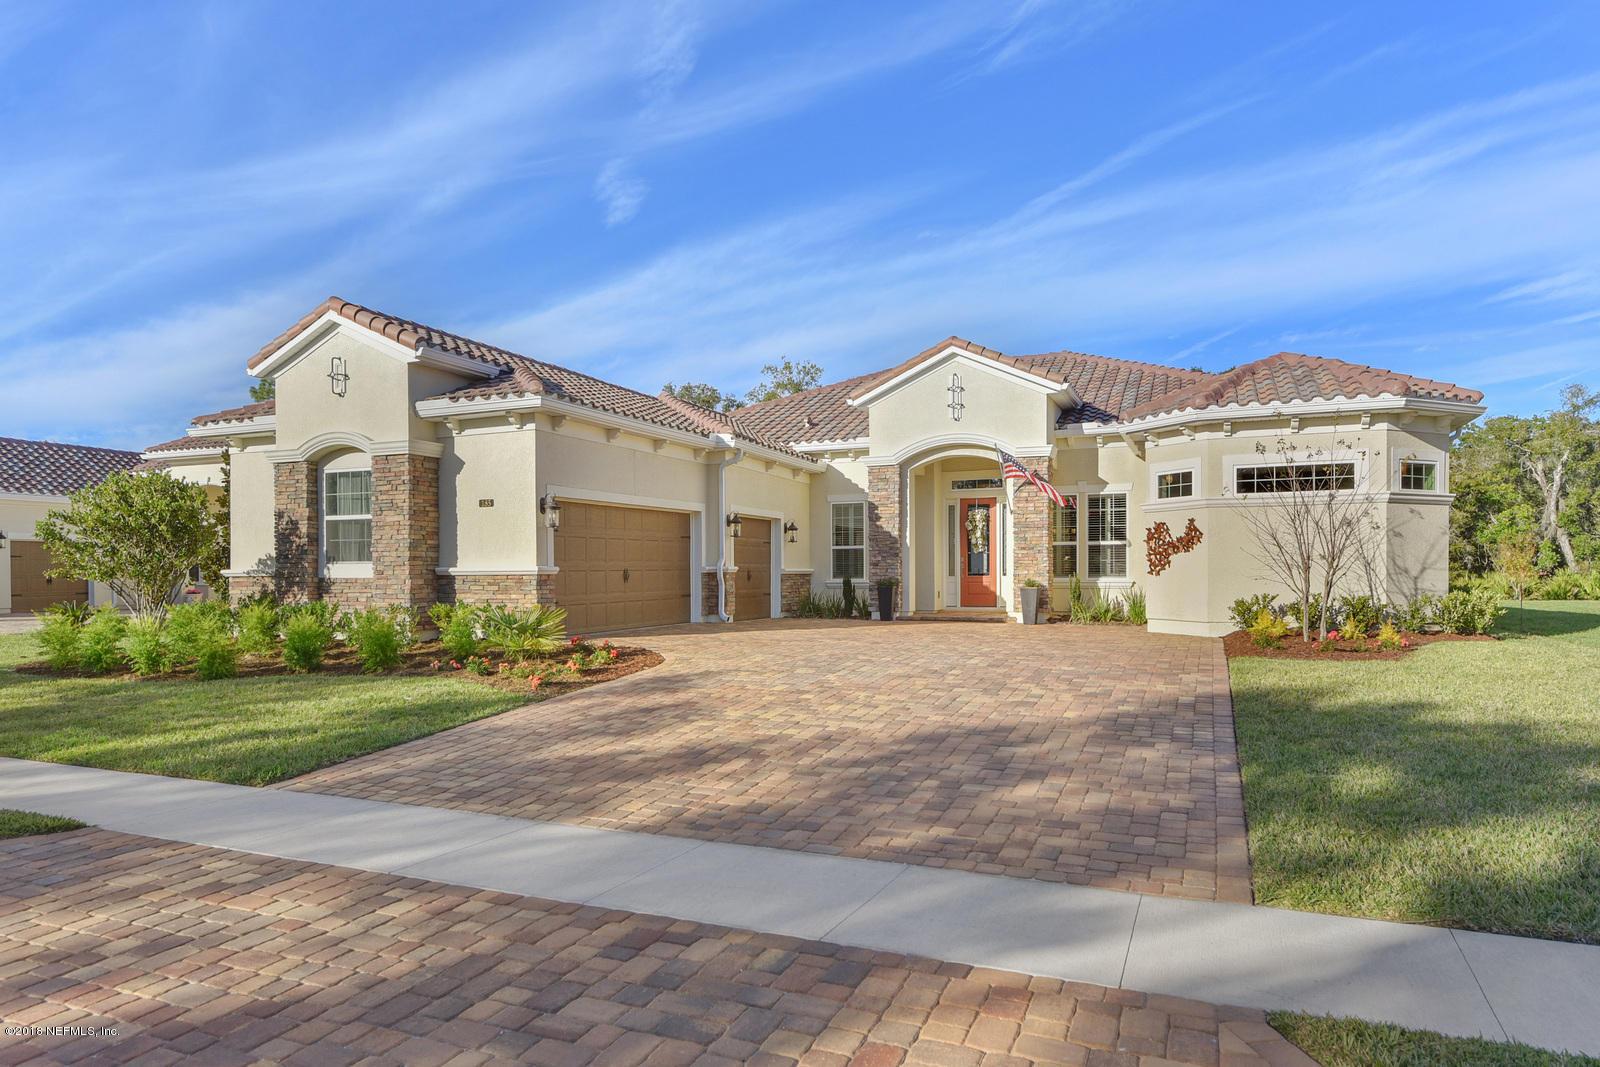 185 BARBELLA, ST AUGUSTINE, FLORIDA 32095, 4 Bedrooms Bedrooms, ,3 BathroomsBathrooms,Residential - single family,For sale,BARBELLA,969300